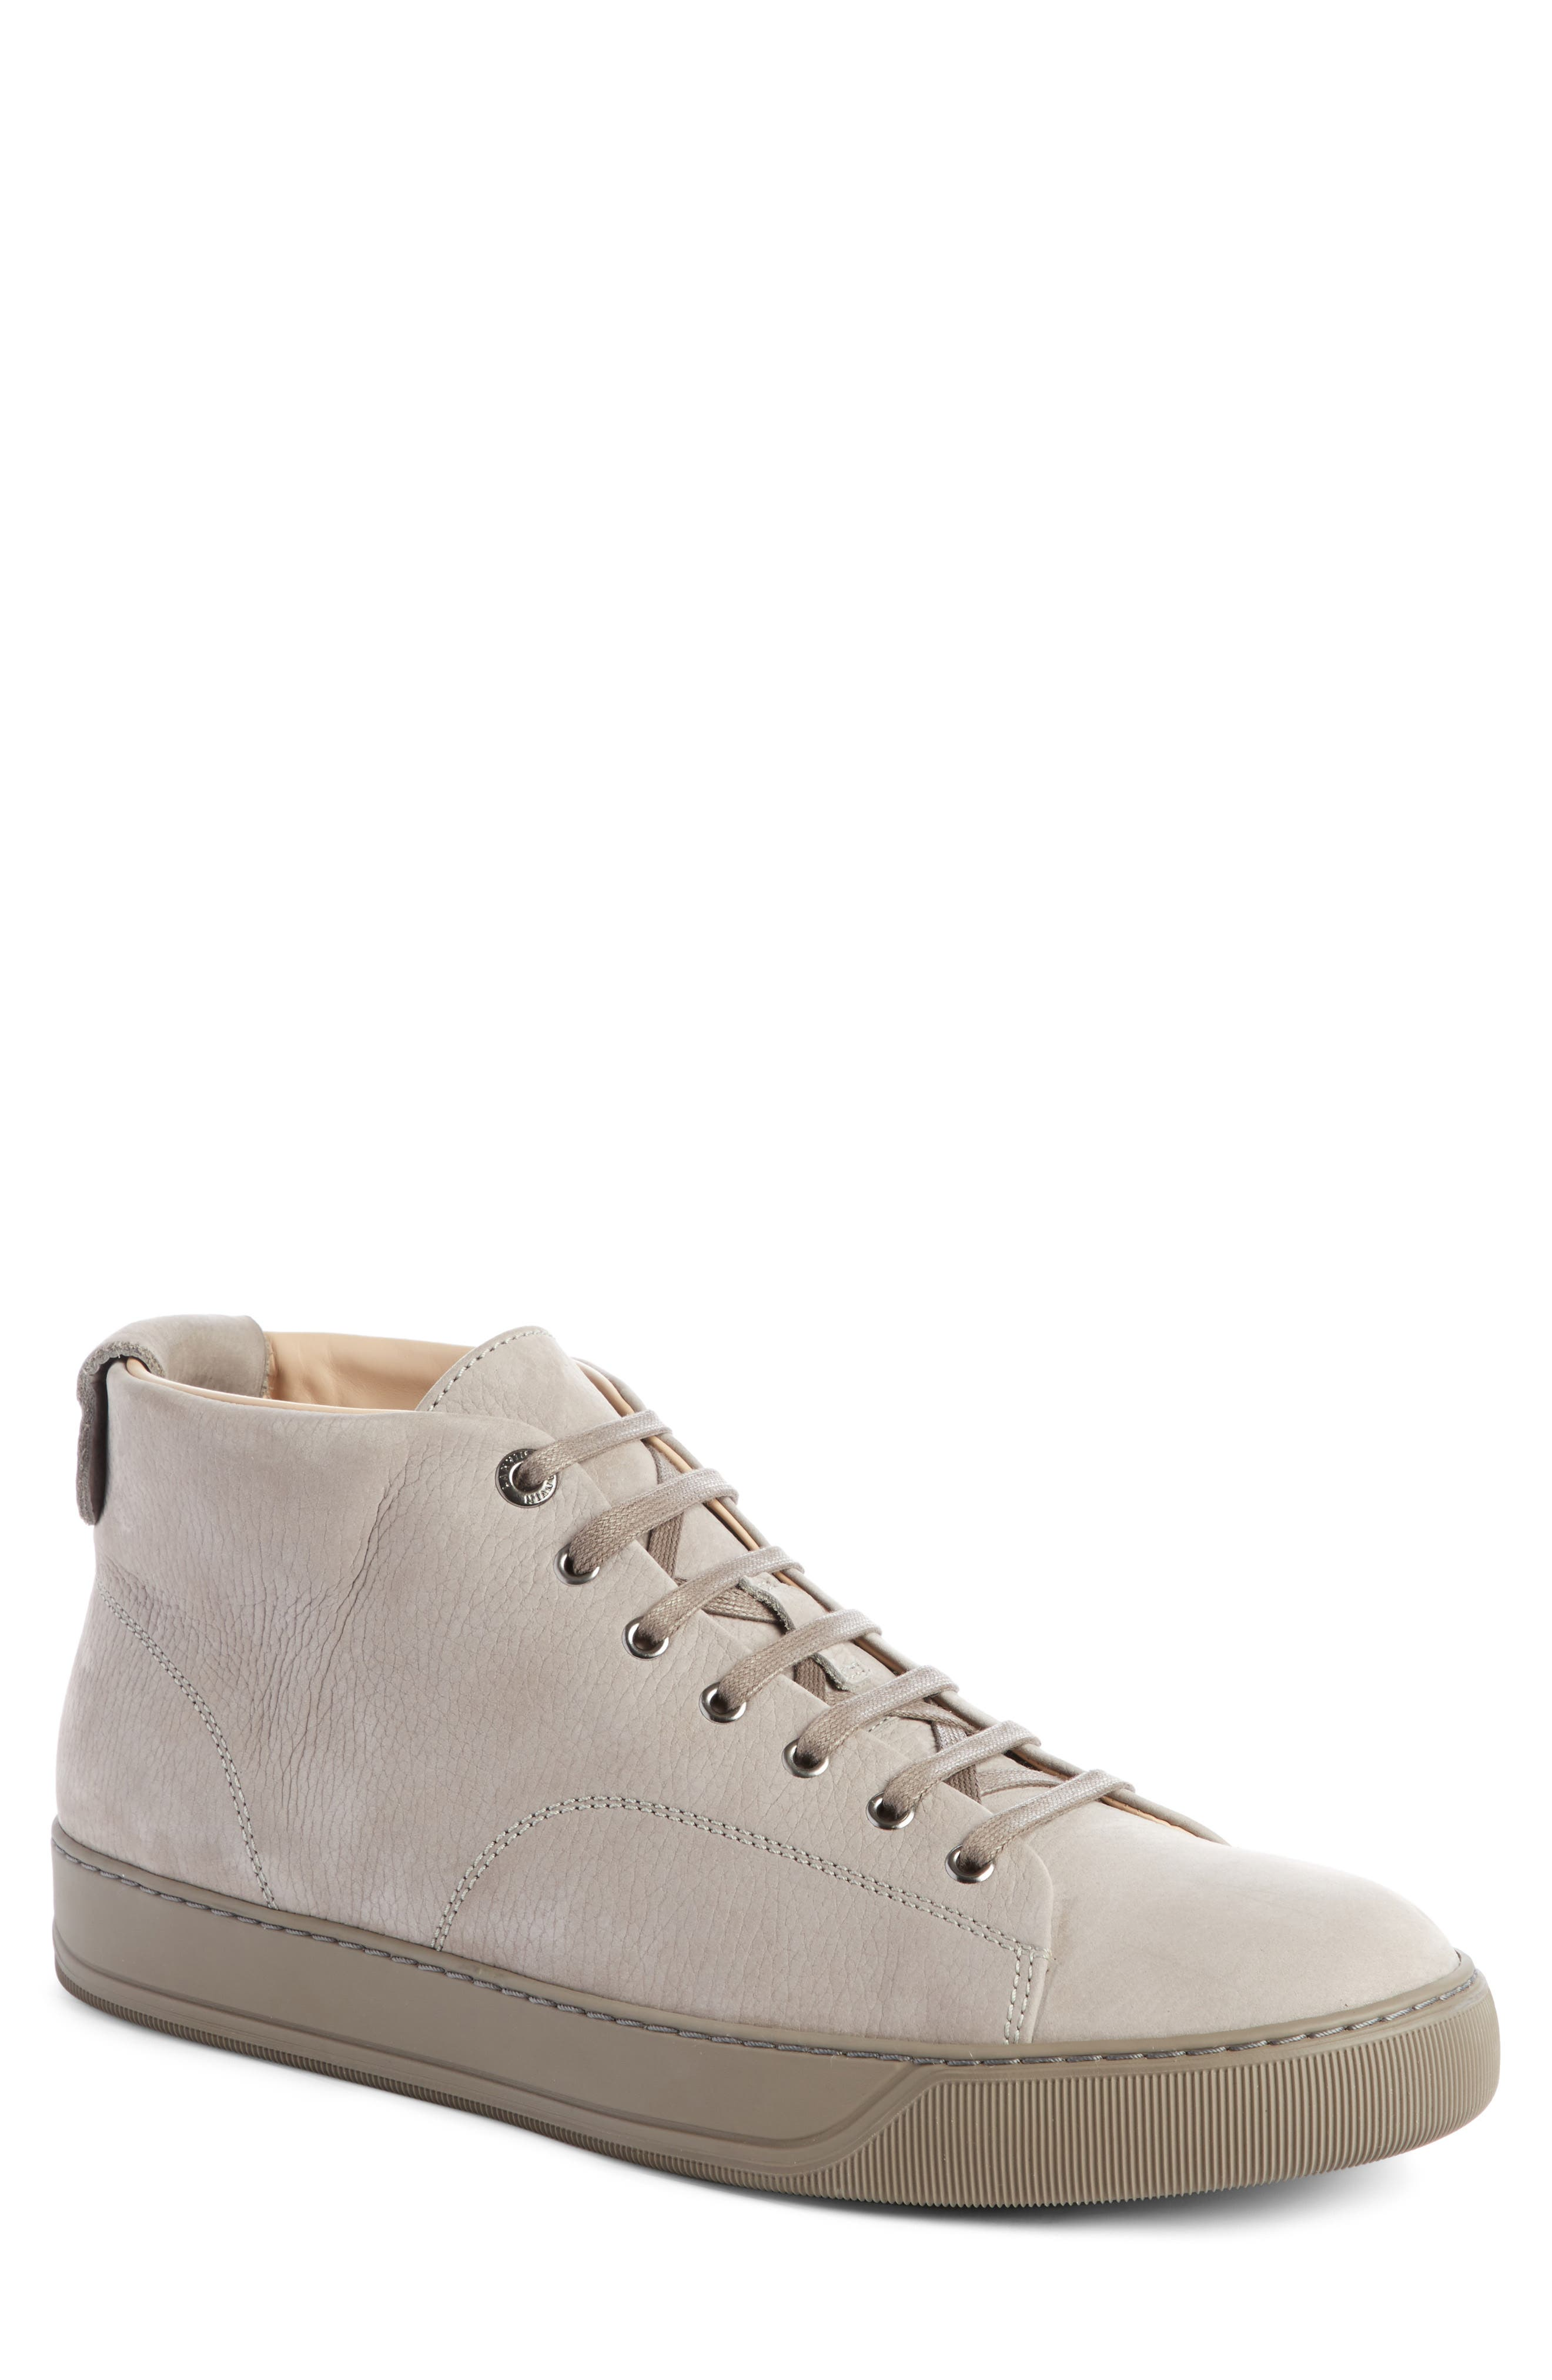 Mid Top Sneaker,                         Main,                         color, 252